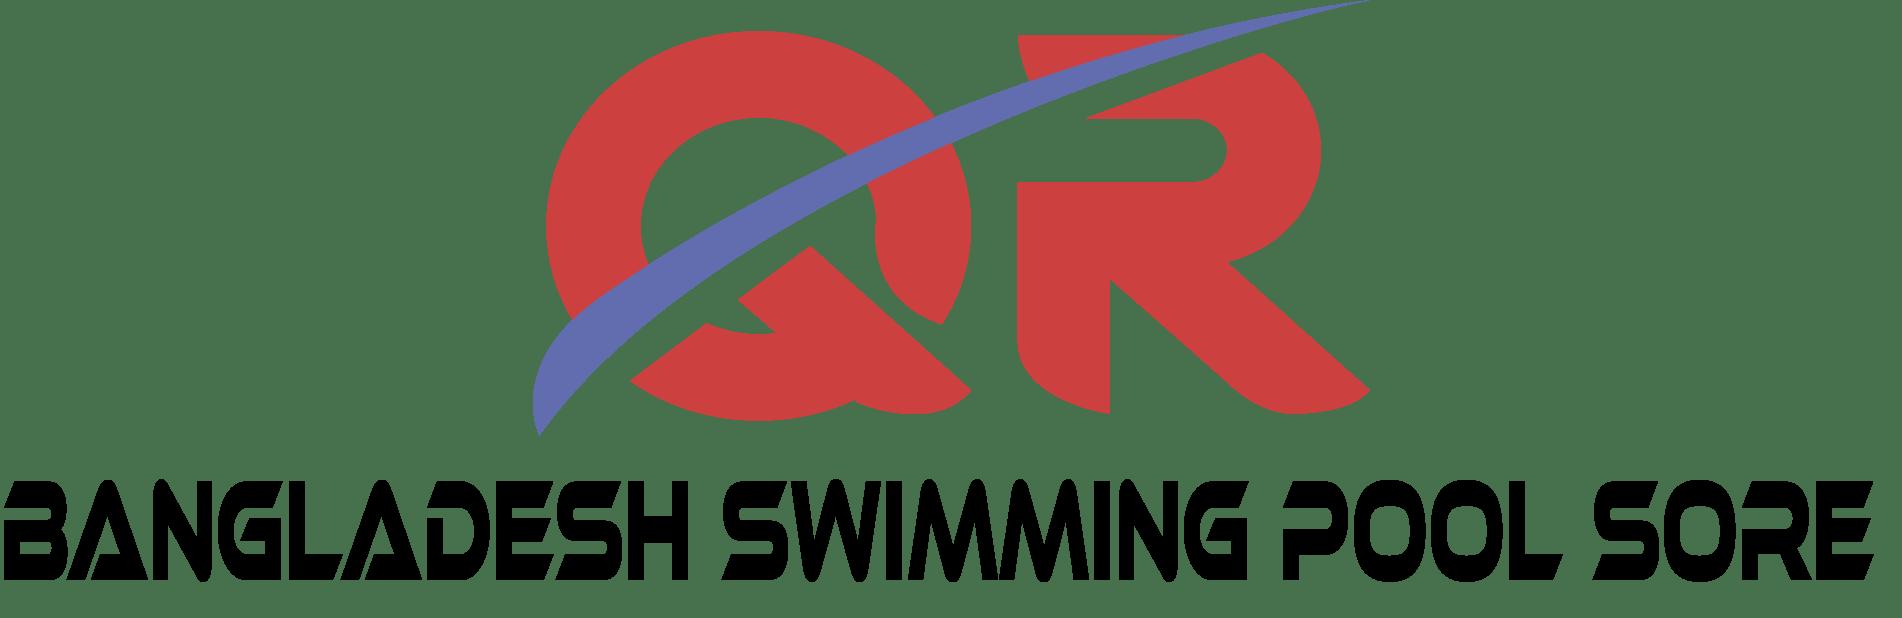 QR BD Swimming Pool Store